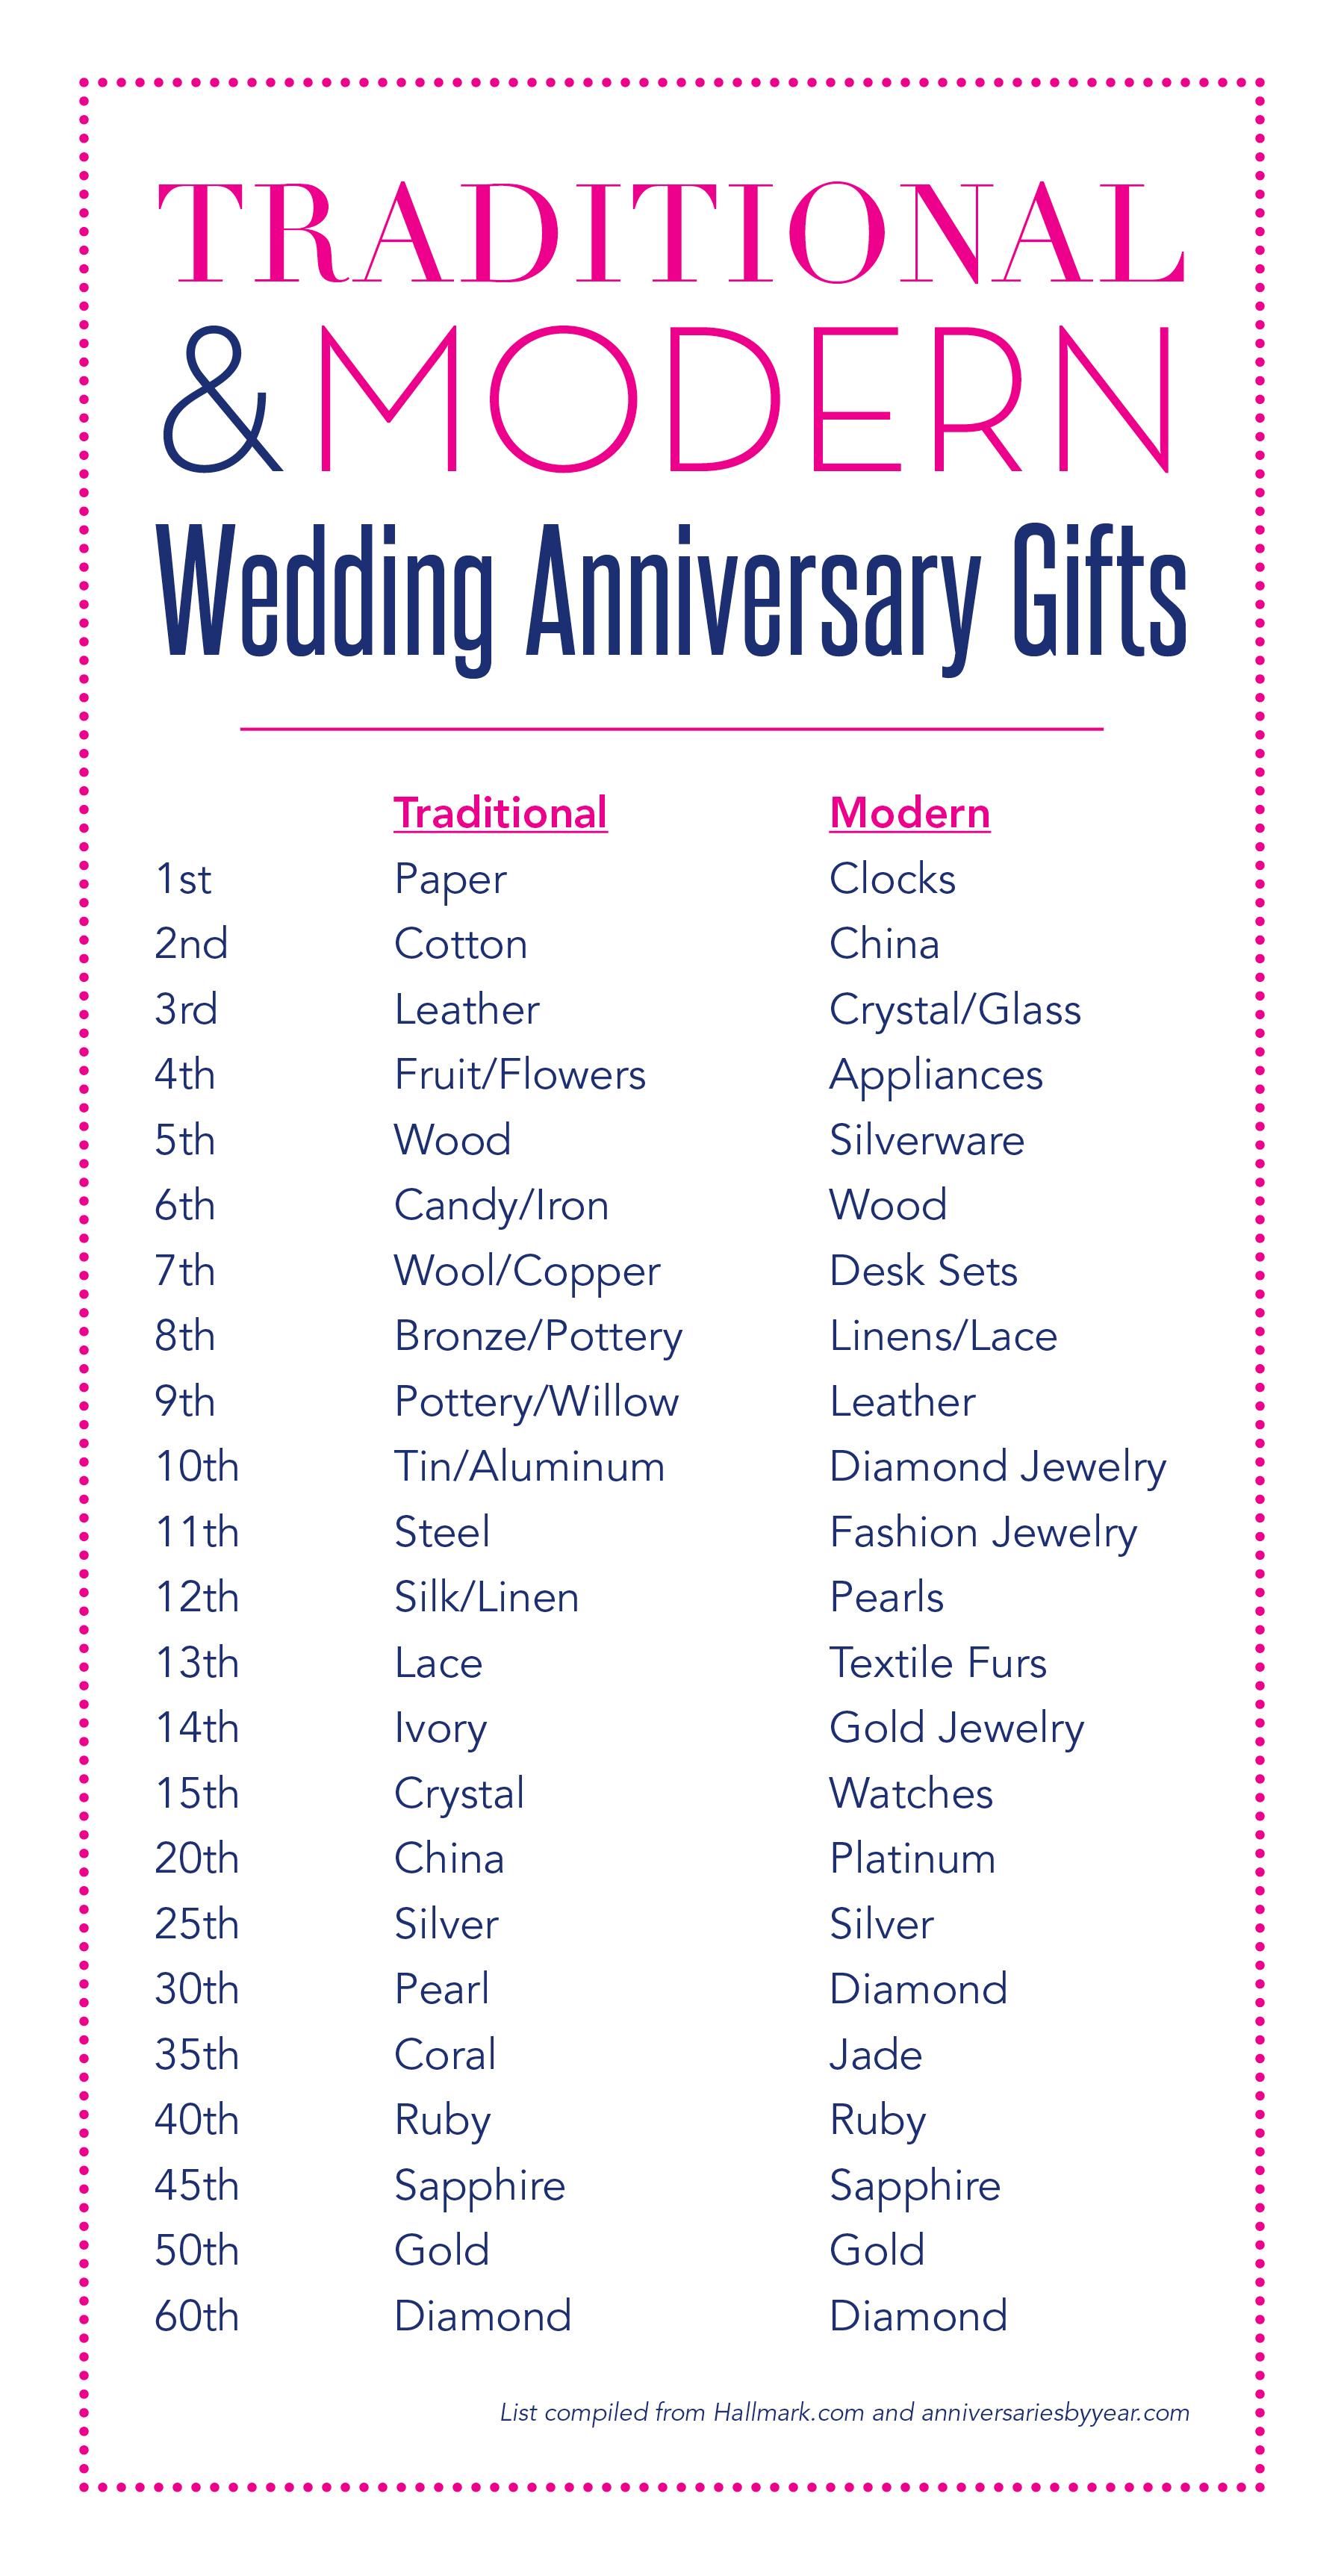 wedding anniversary gifts 1st wedding anniversary gift wedding anniversary gifts traditional modern